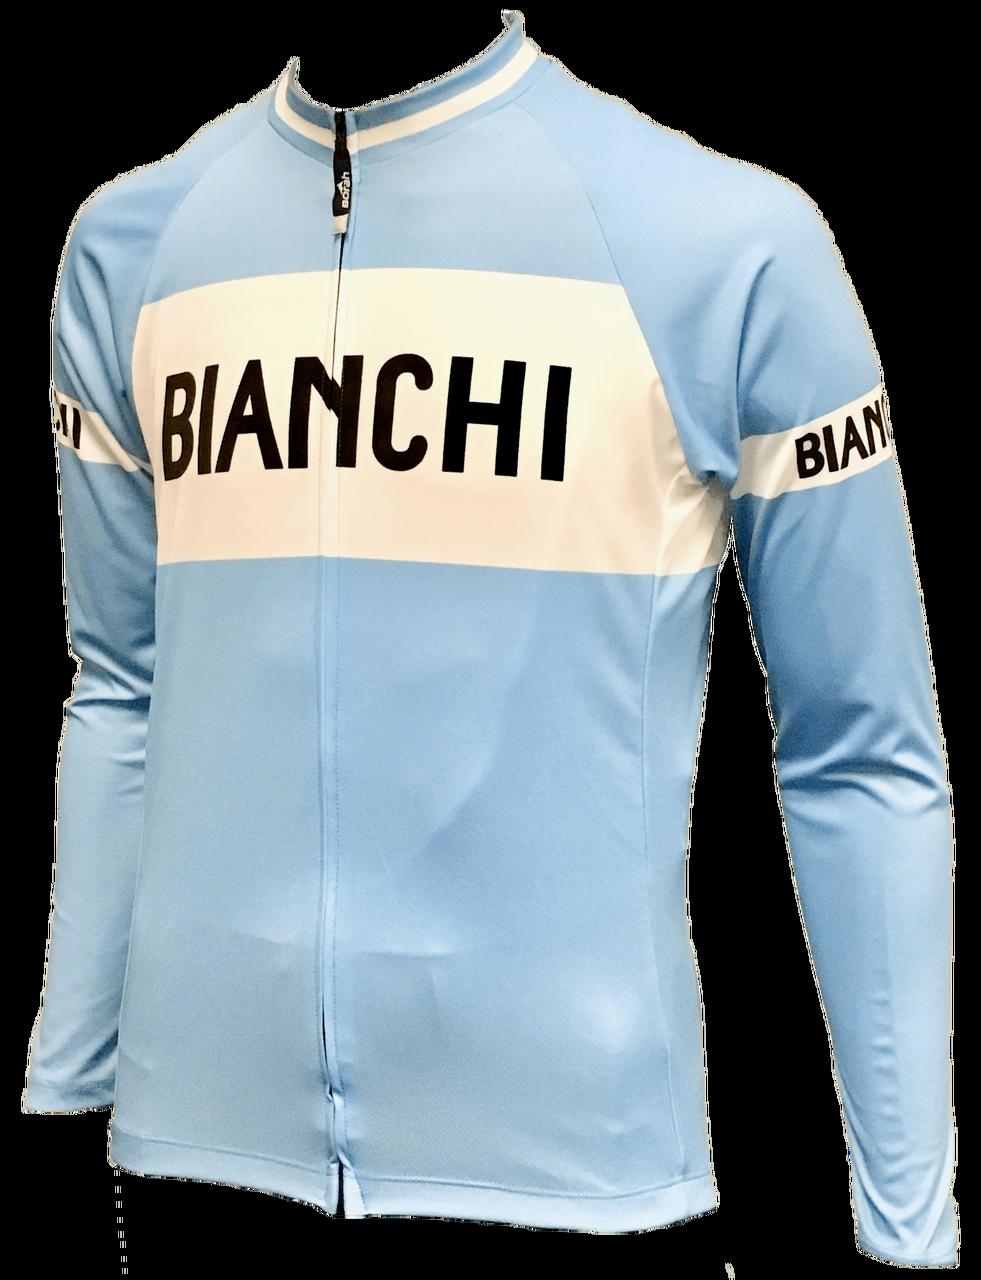 Bianchi  34afd0593